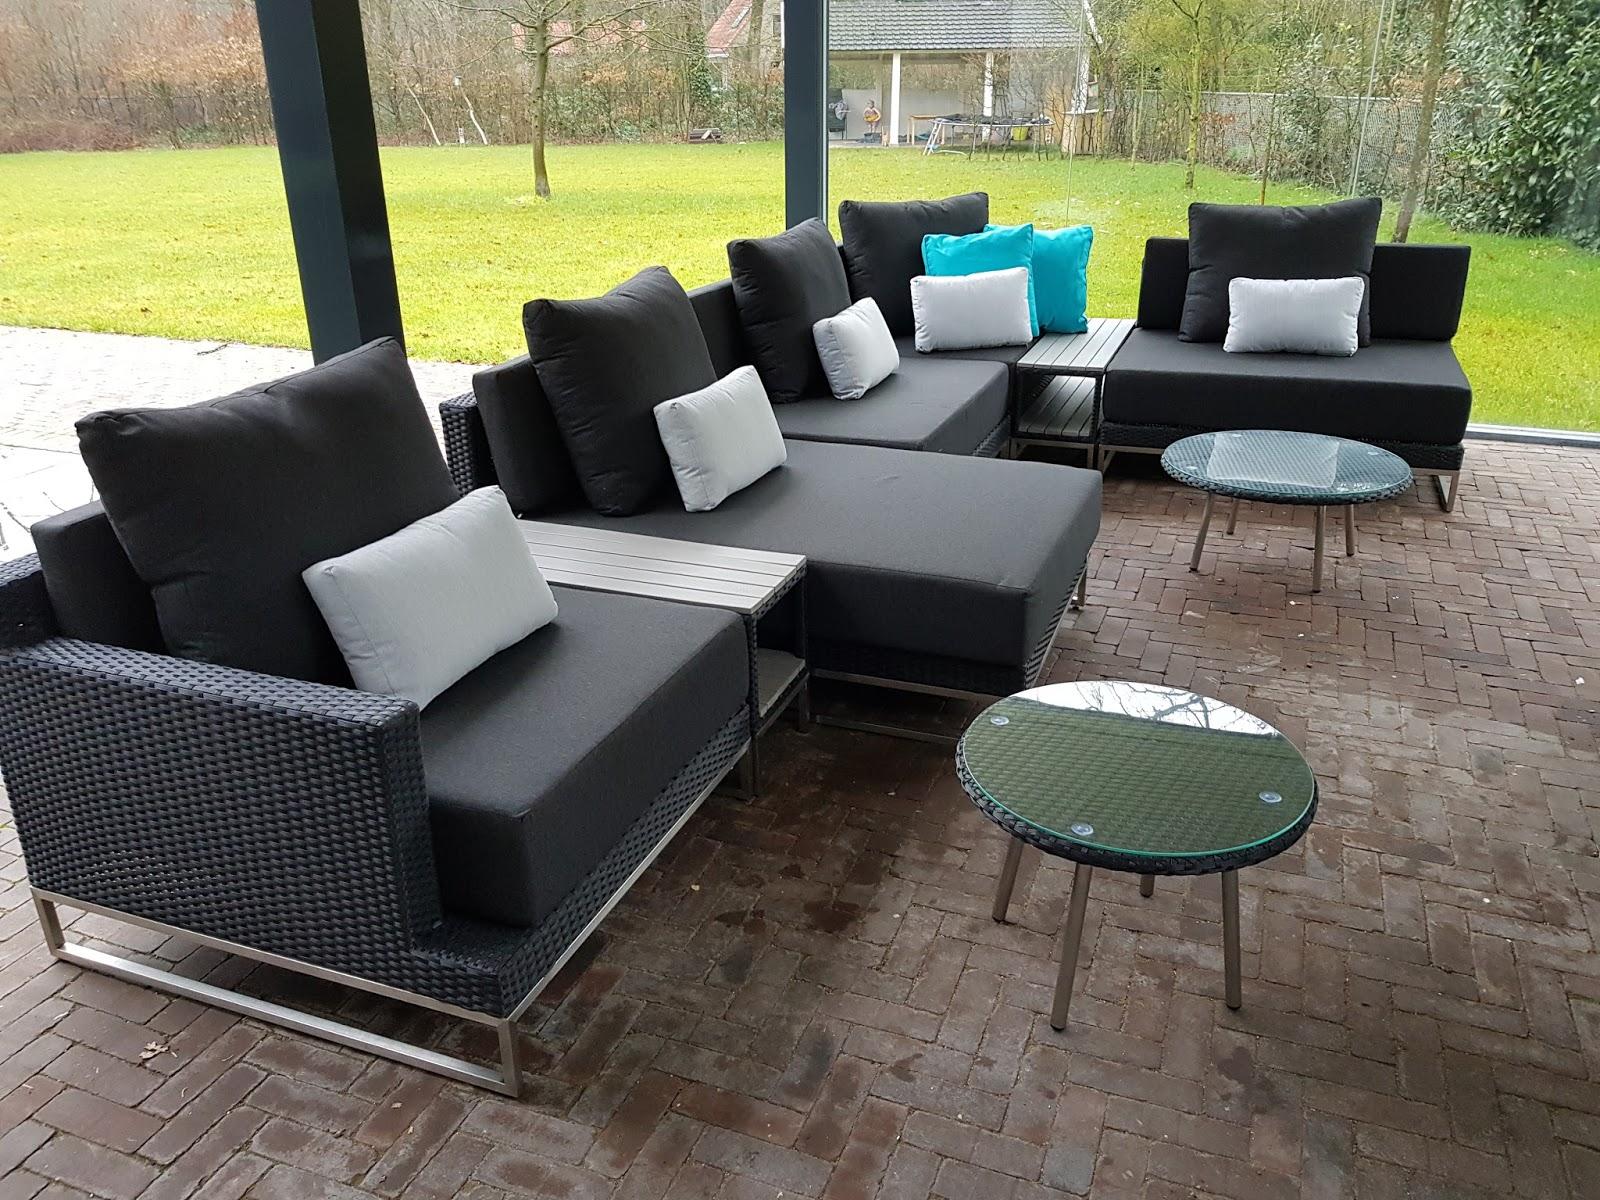 Design Lounge Tuin Bank.Arbrini Design Tuinmeubelen Maart 2018